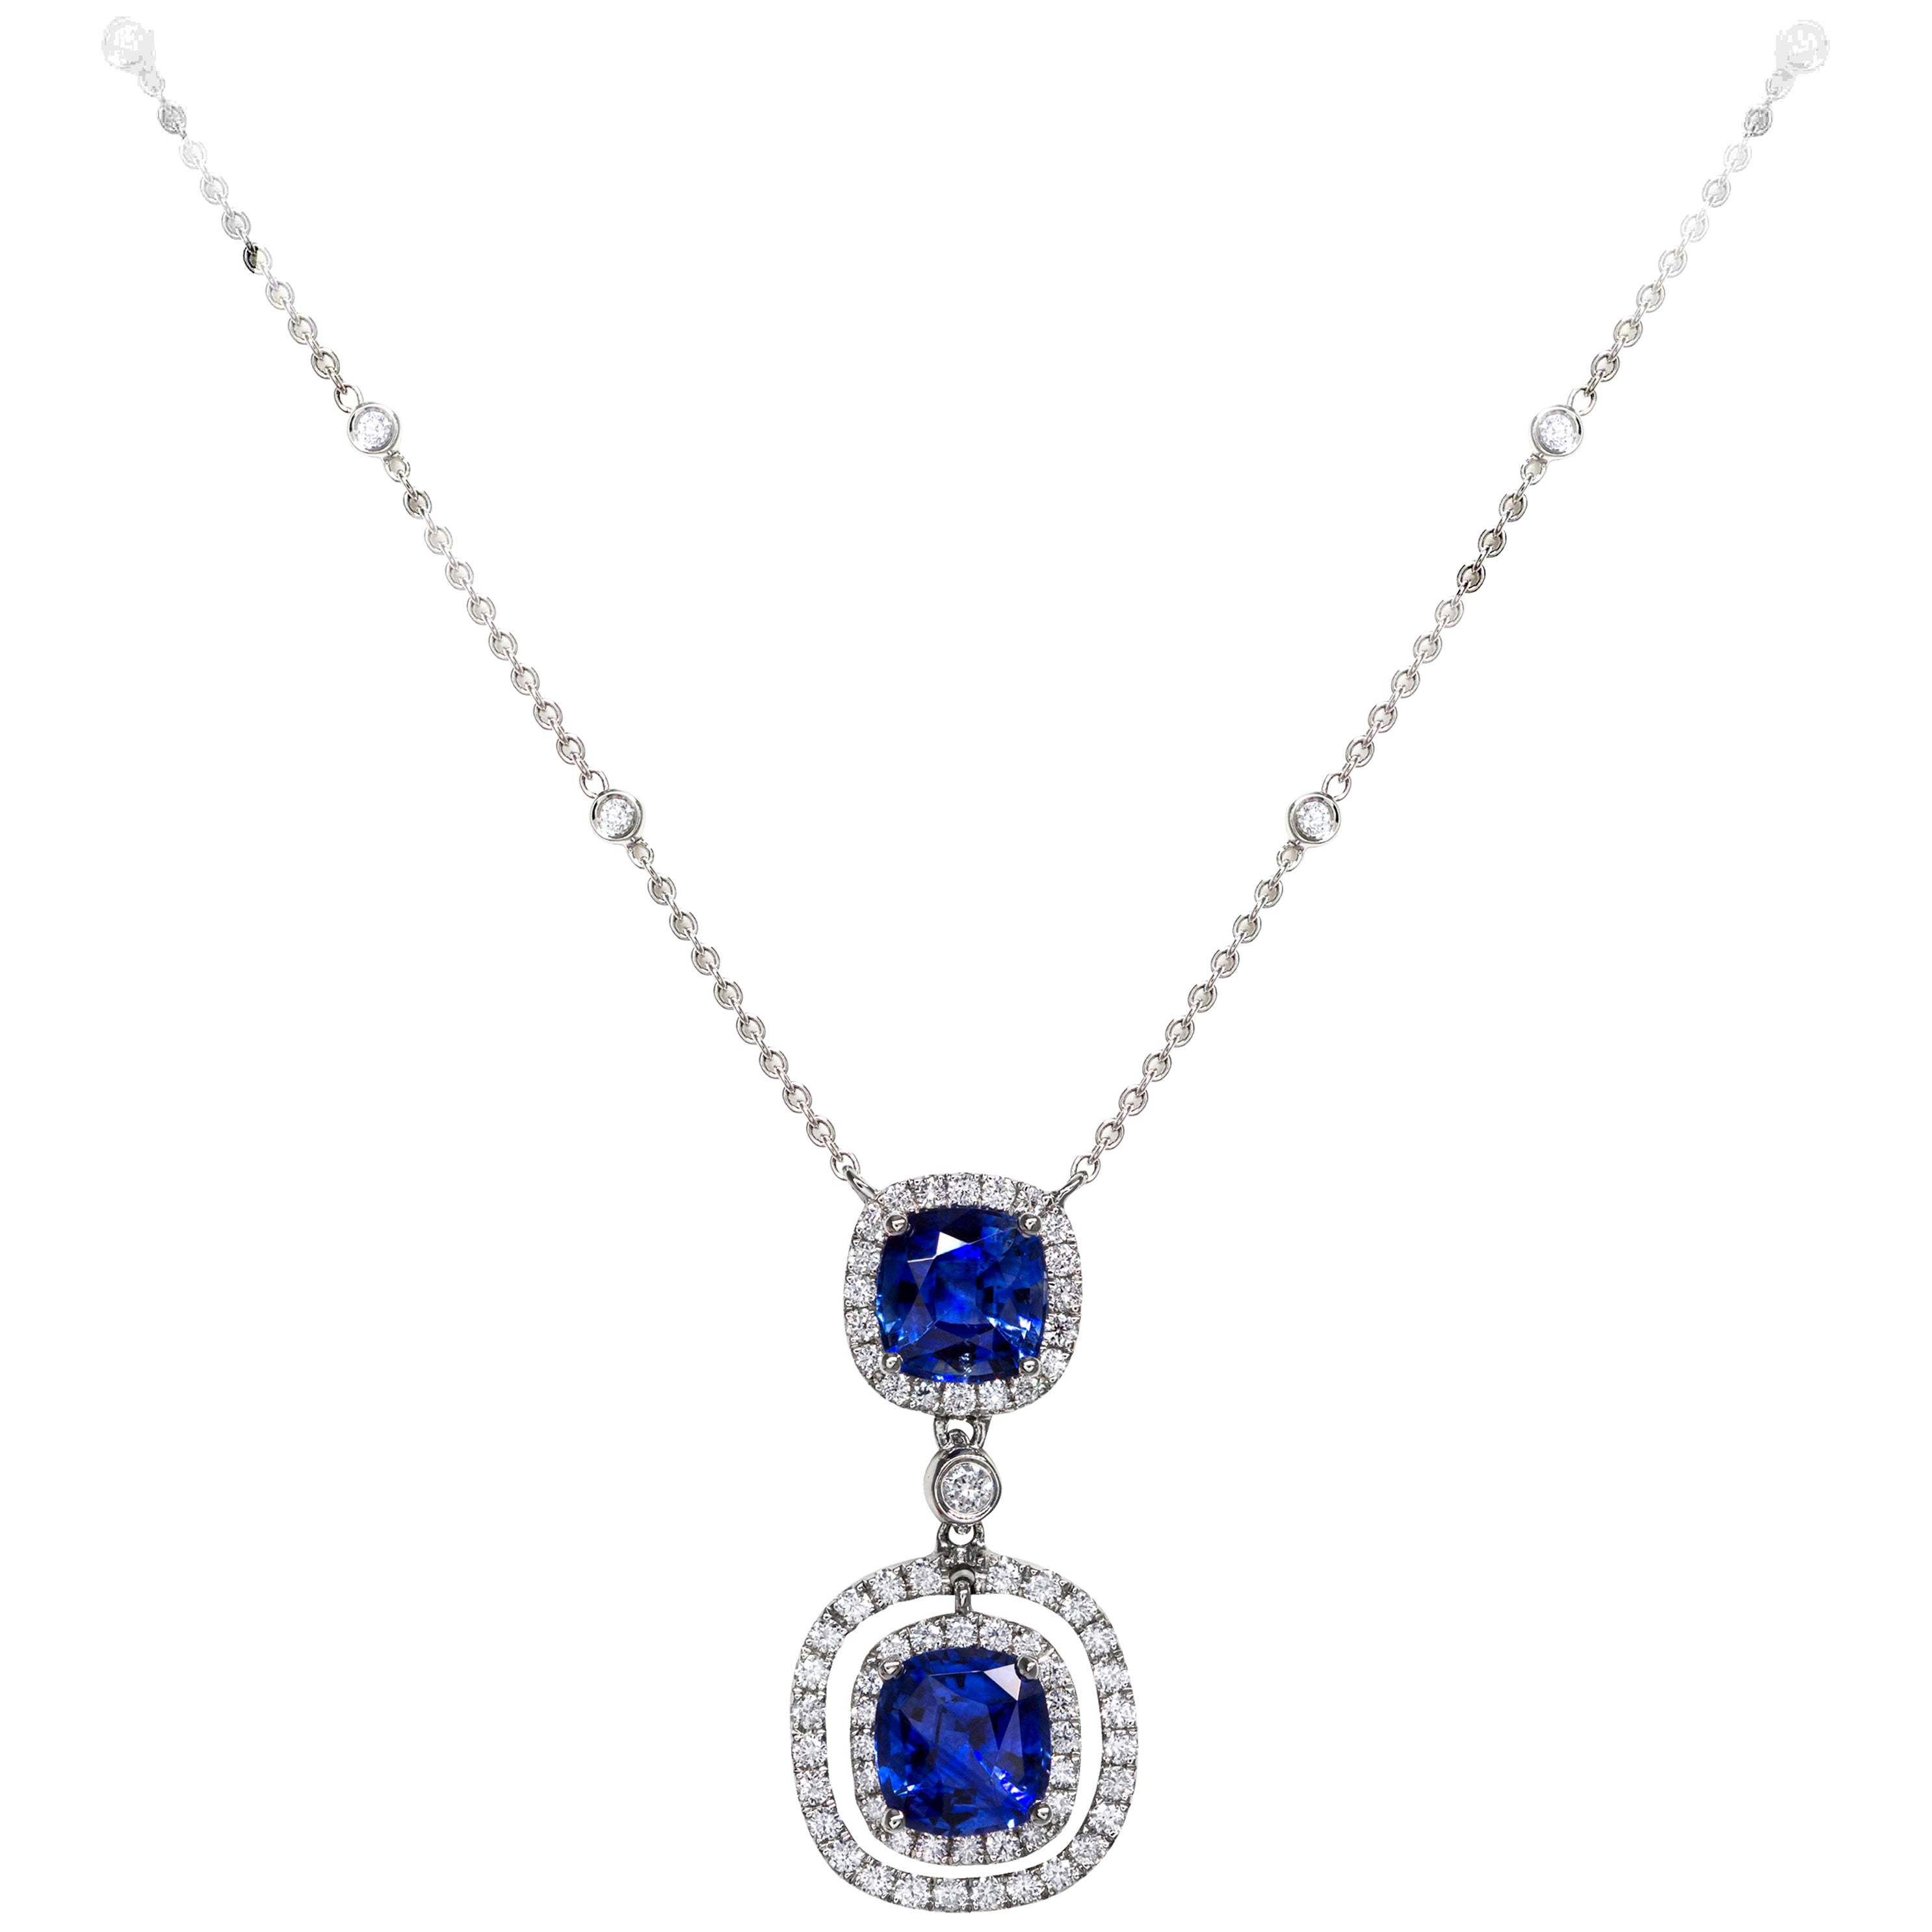 Roman Malakov, Cushion Cut Blue Sapphire and Diamond Halo Drop Necklace